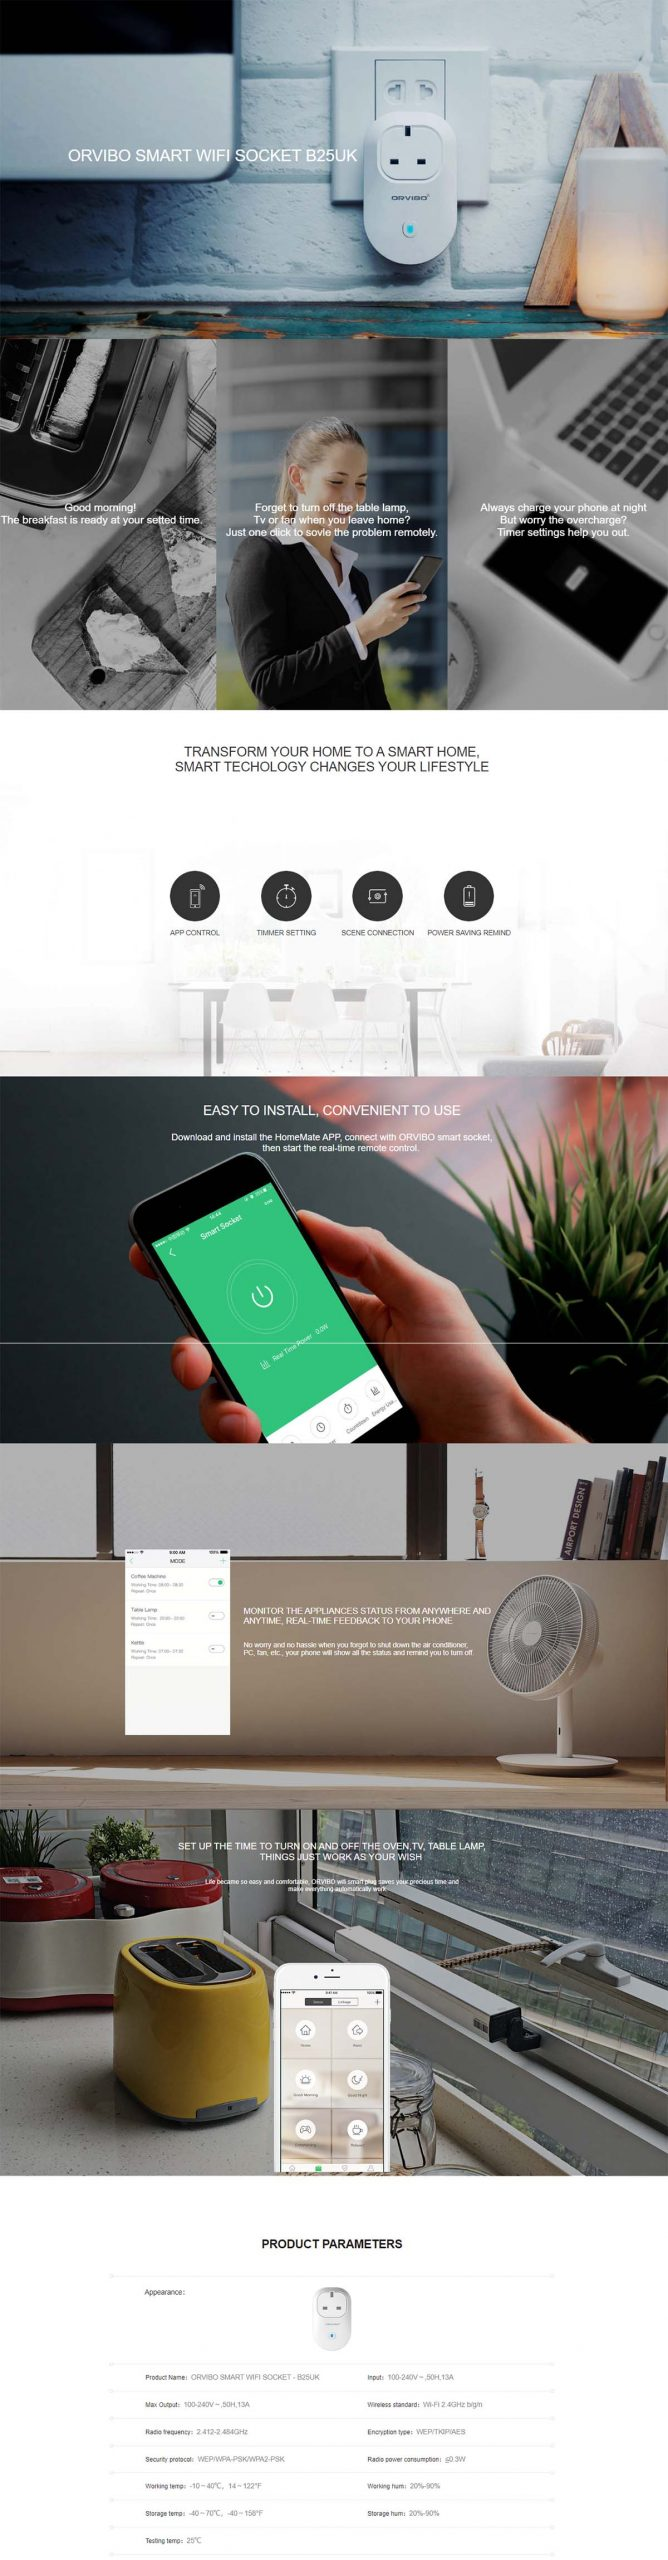 ORVIBO Smart WiFi Plug